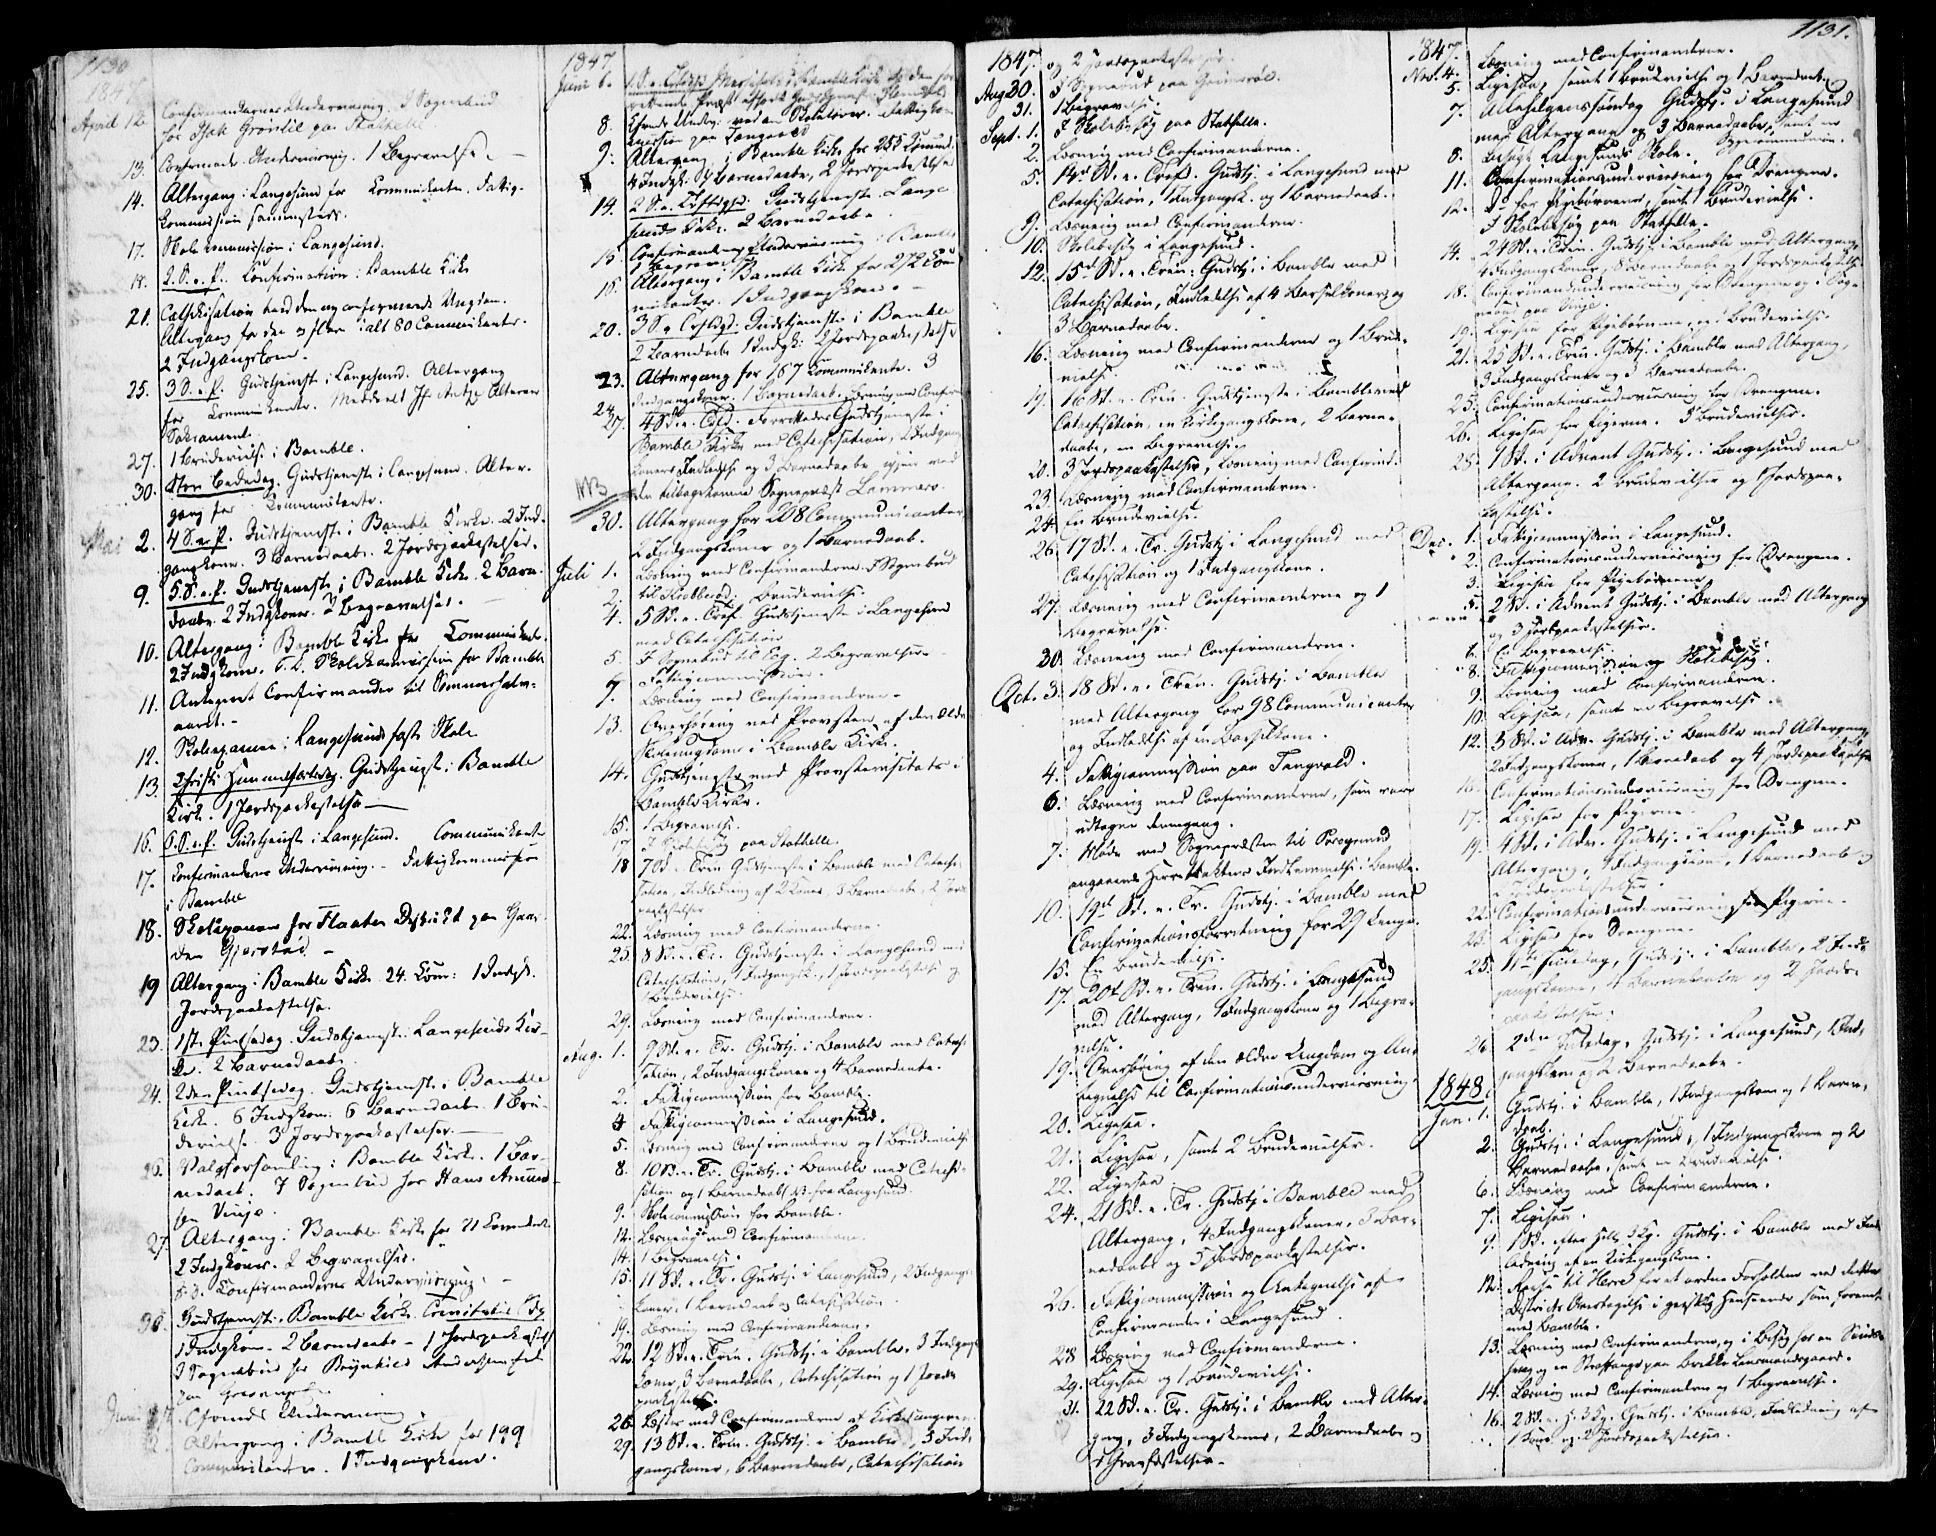 SAKO, Bamble kirkebøker, F/Fa/L0004: Ministerialbok nr. I 4, 1834-1853, s. 1130-1131